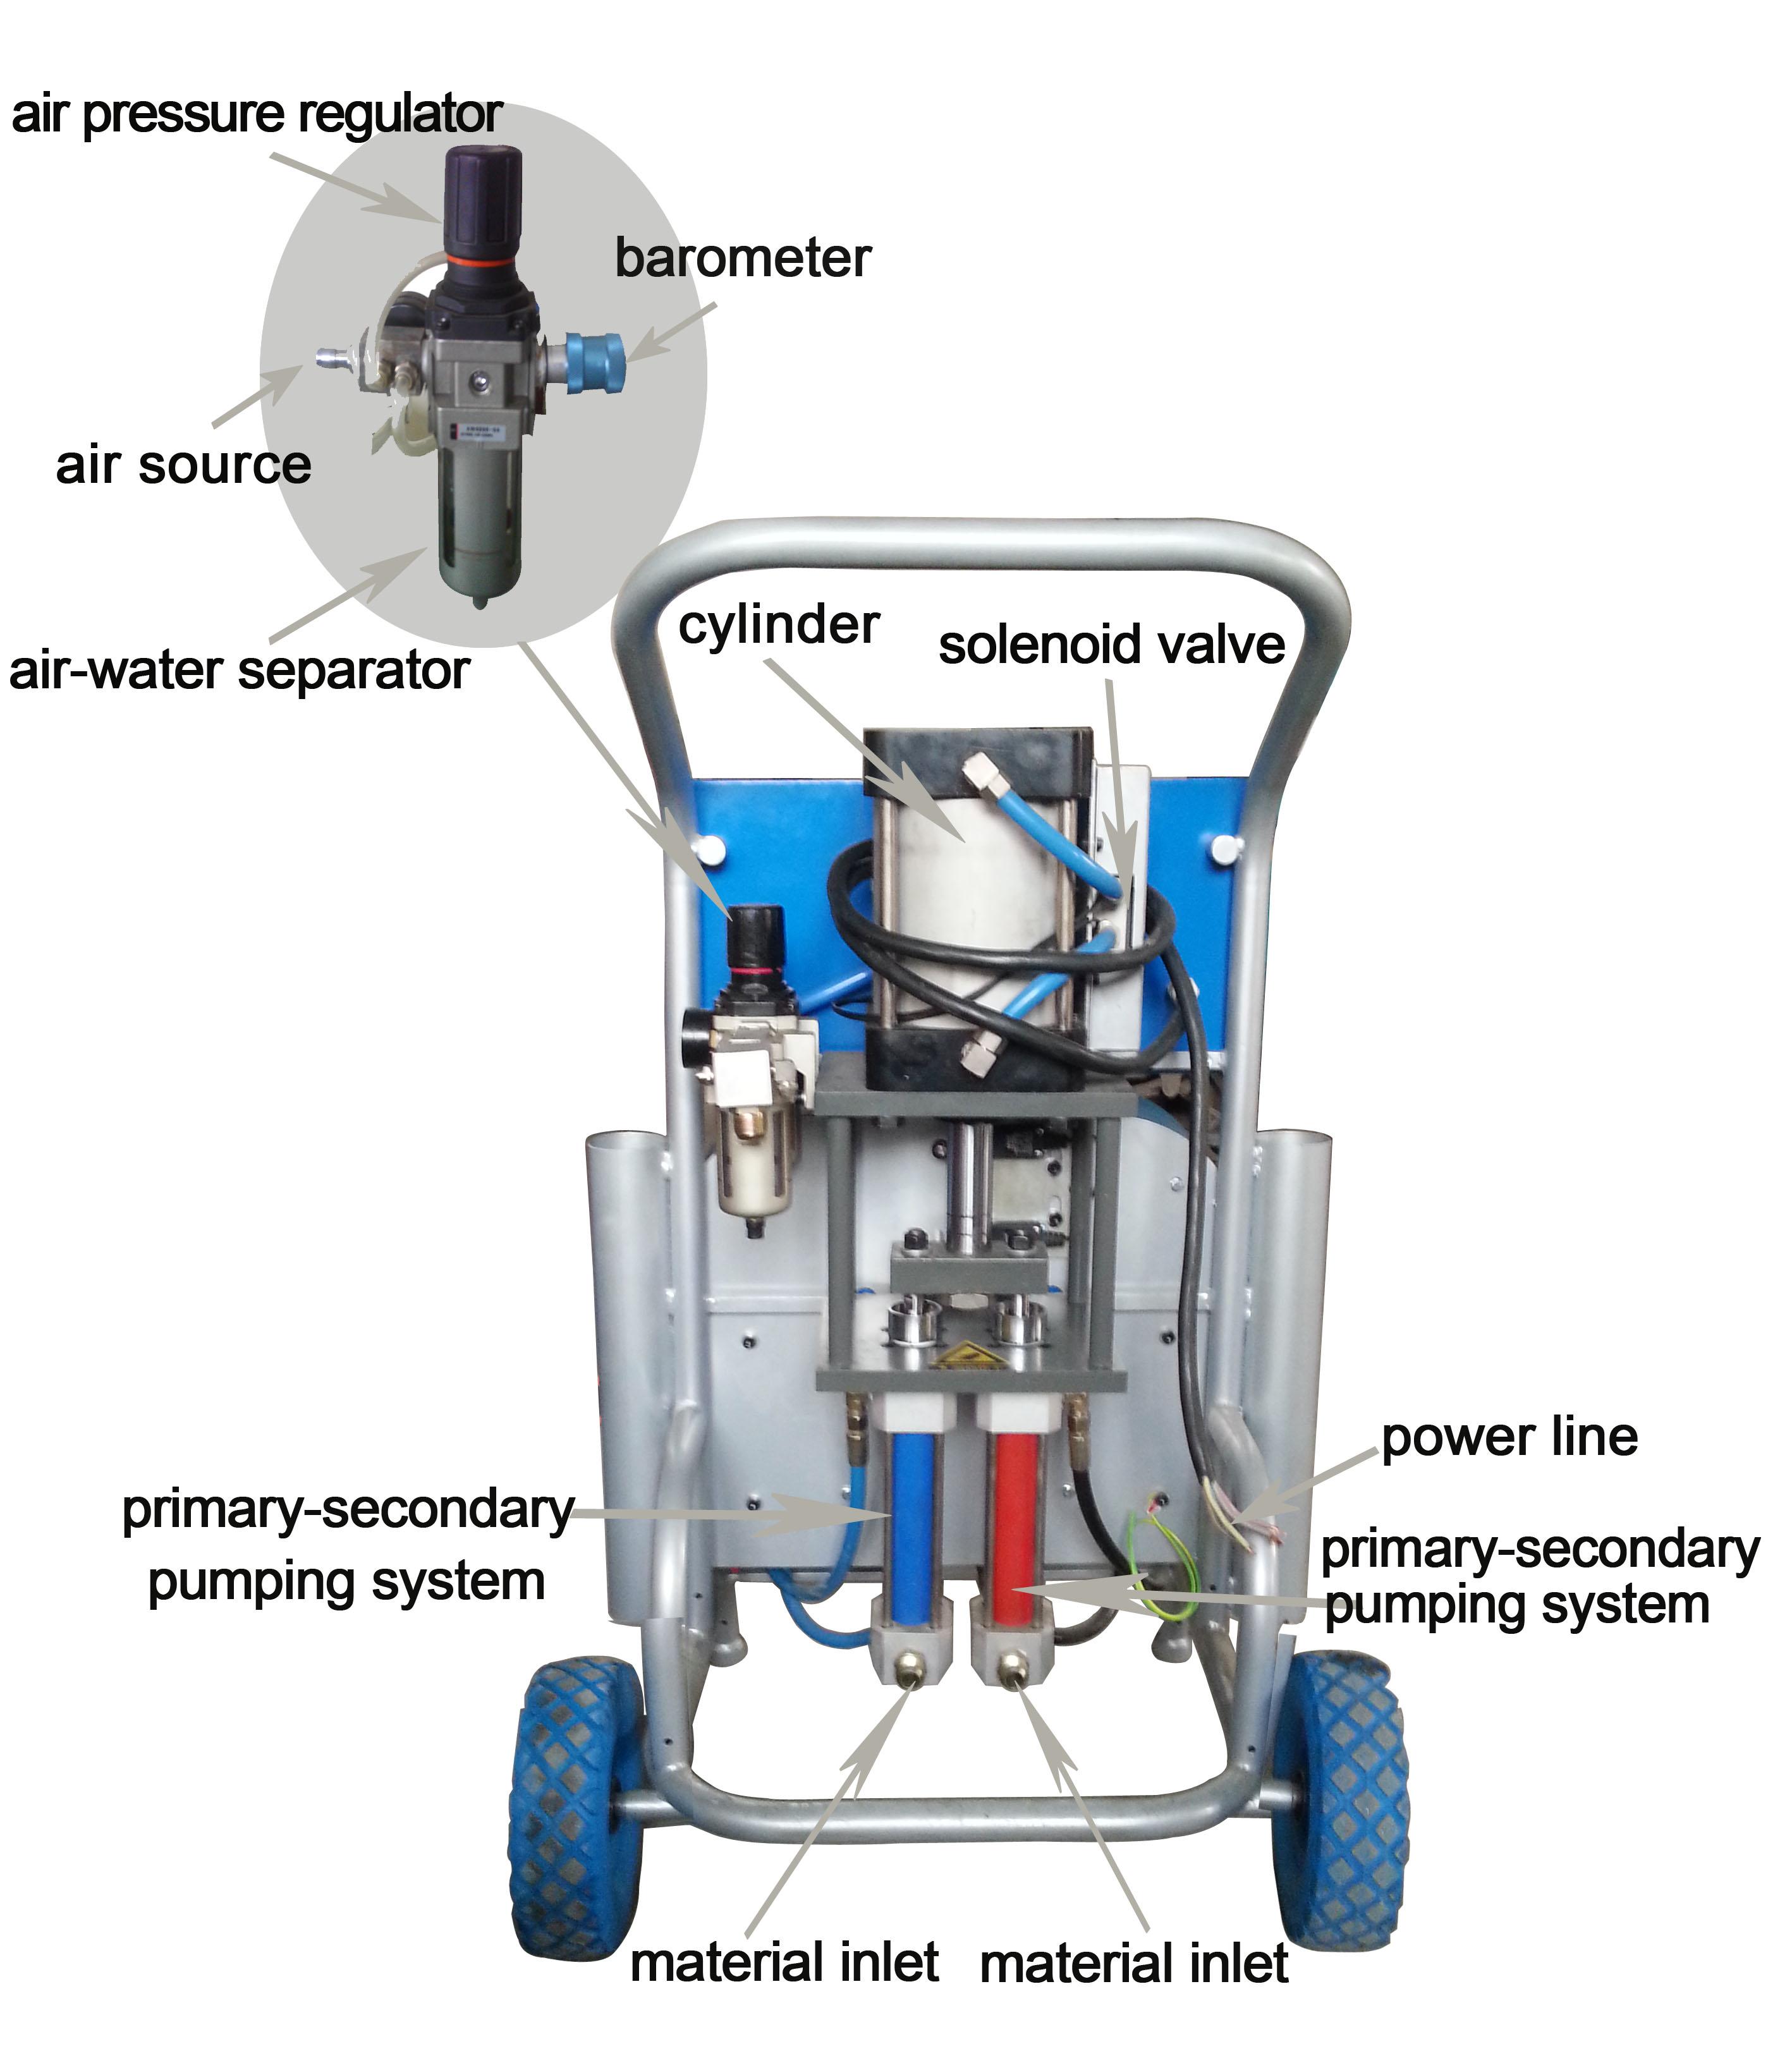 High Quality Spray Foam Painting Equipment Diy Polyurea Coating Machine -  Buy Diy Polyurea Coating,Spray Foam Painting,Diy Polyurea Coating Machine